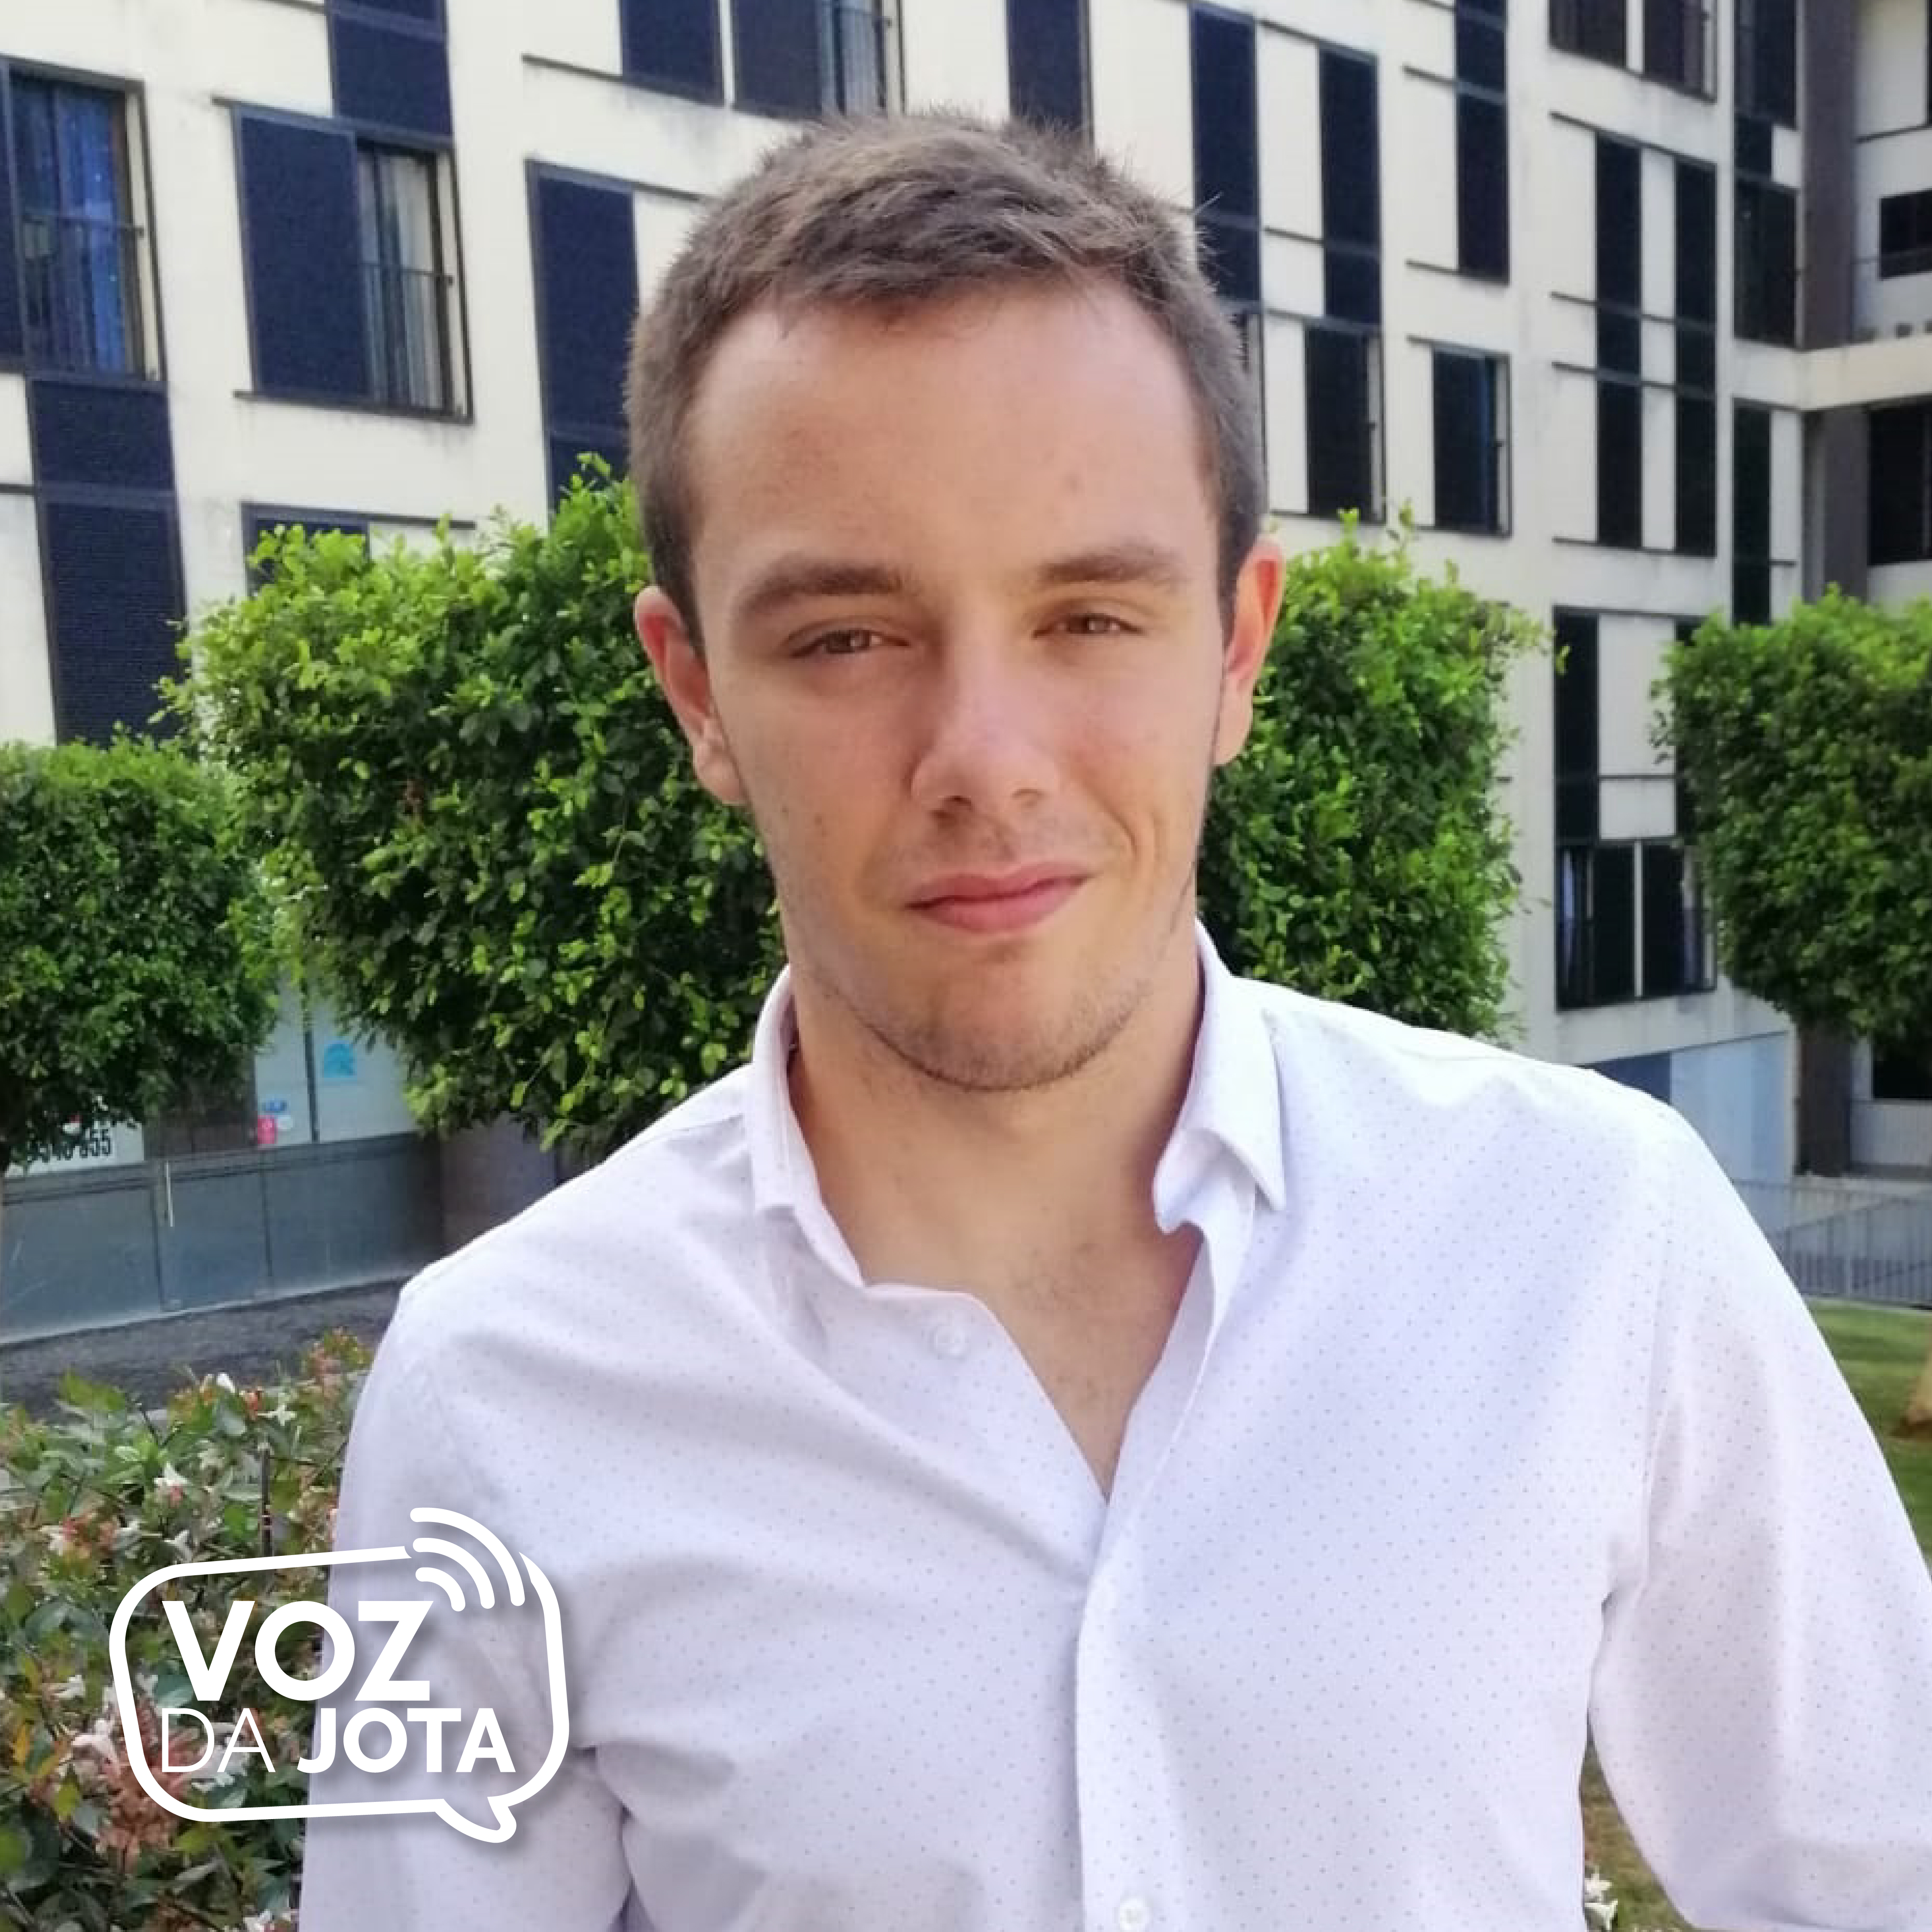 VITOR_VozdaJota_vozdajota_site